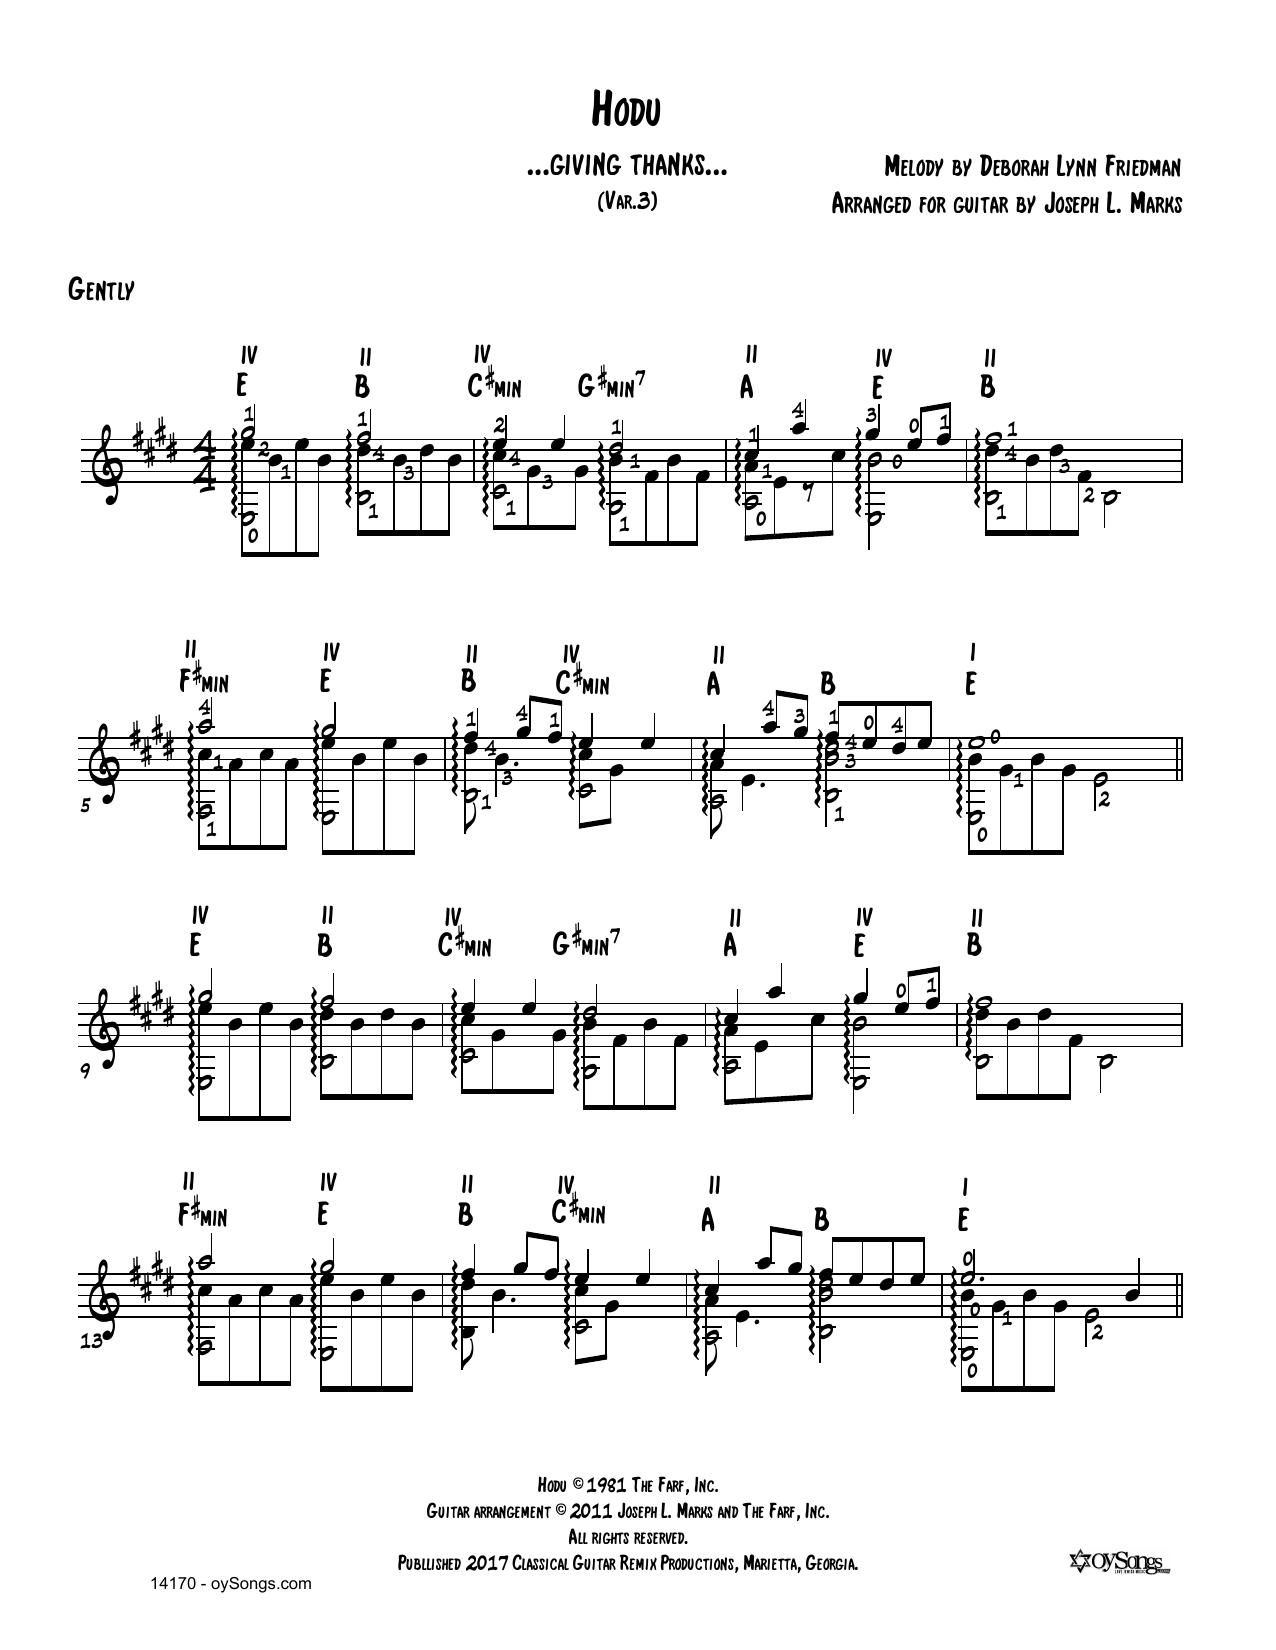 Debbie Friedman Hodu Vars 1, 2 (arr. Joe Marks) sheet music notes and chords. Download Printable PDF.